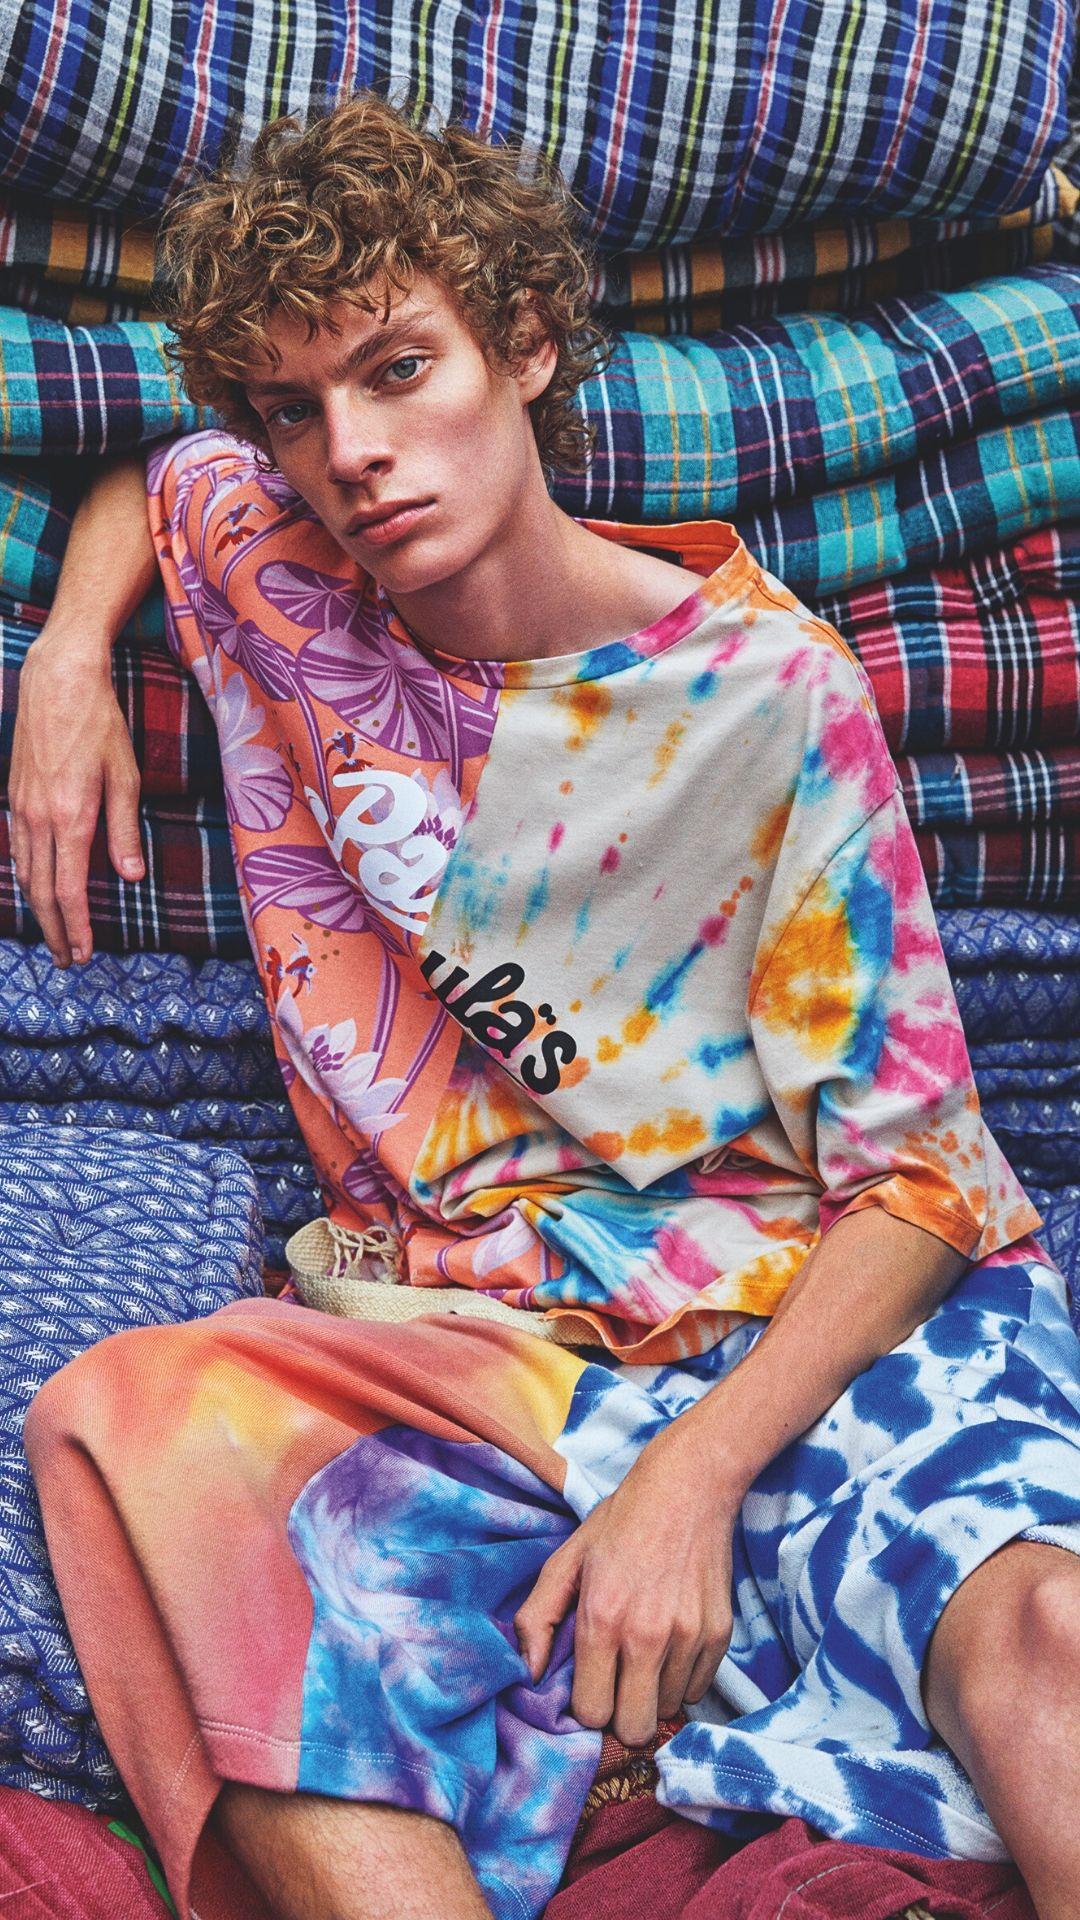 loewe, Paula's, capsule collection, ibiza, fashion, menswear, style, ss20